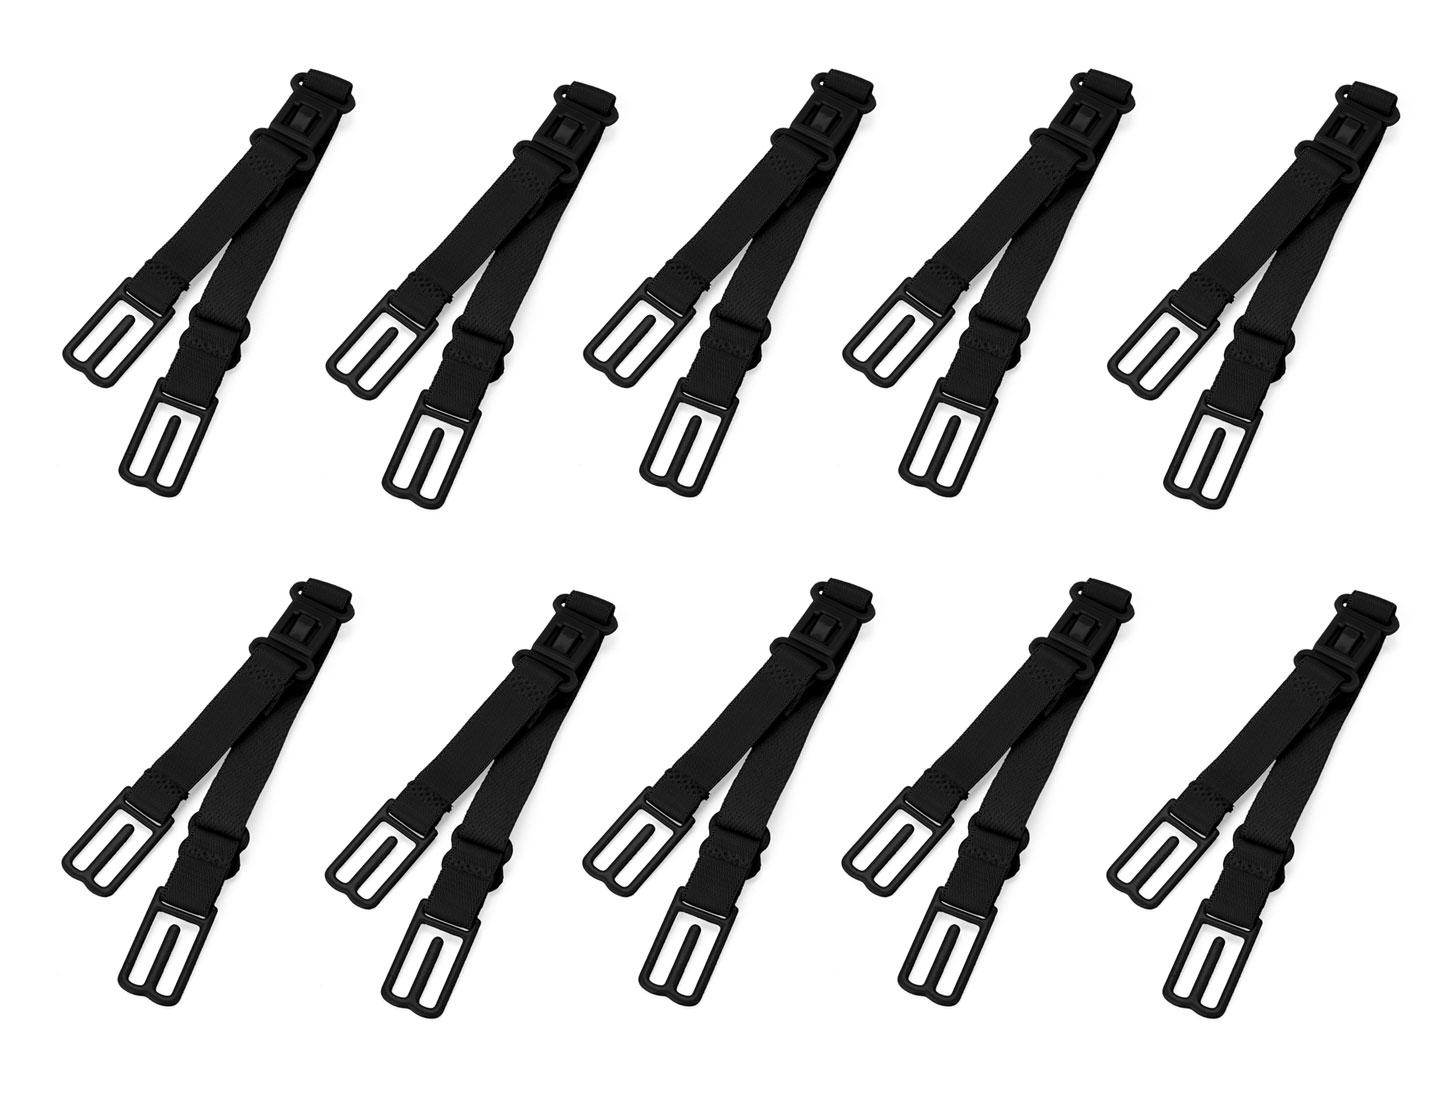 Women Elastic Band Non-Slip Adjustable Bra Straps Holder 10 Pcs Black